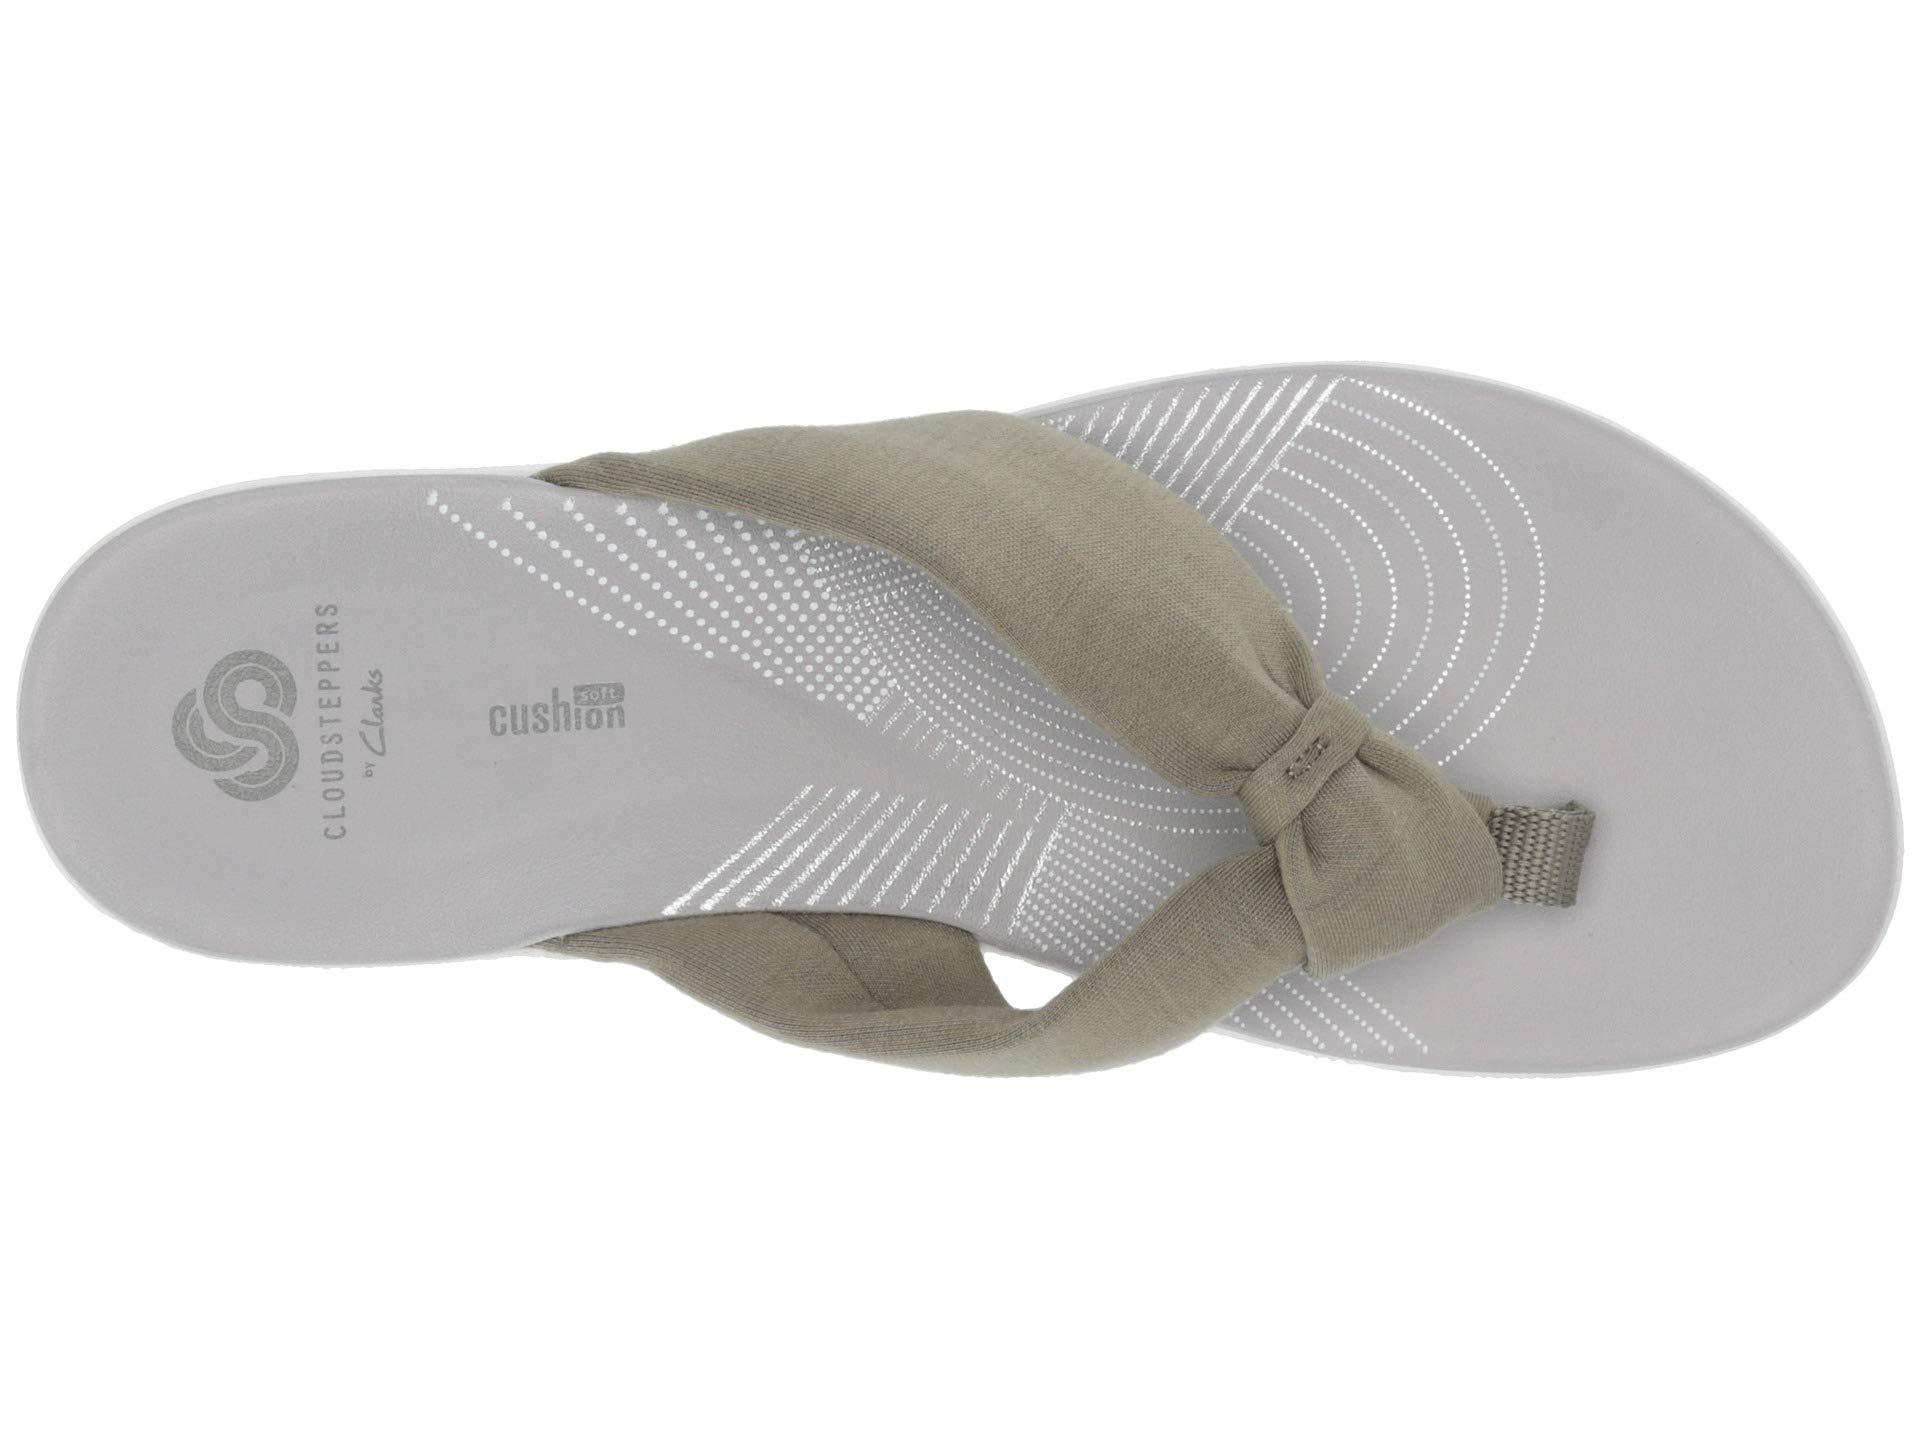 eff8e86209772f ... Arla Glison (red Printed Fabric) Women s Sandals - Lyst. View fullscreen